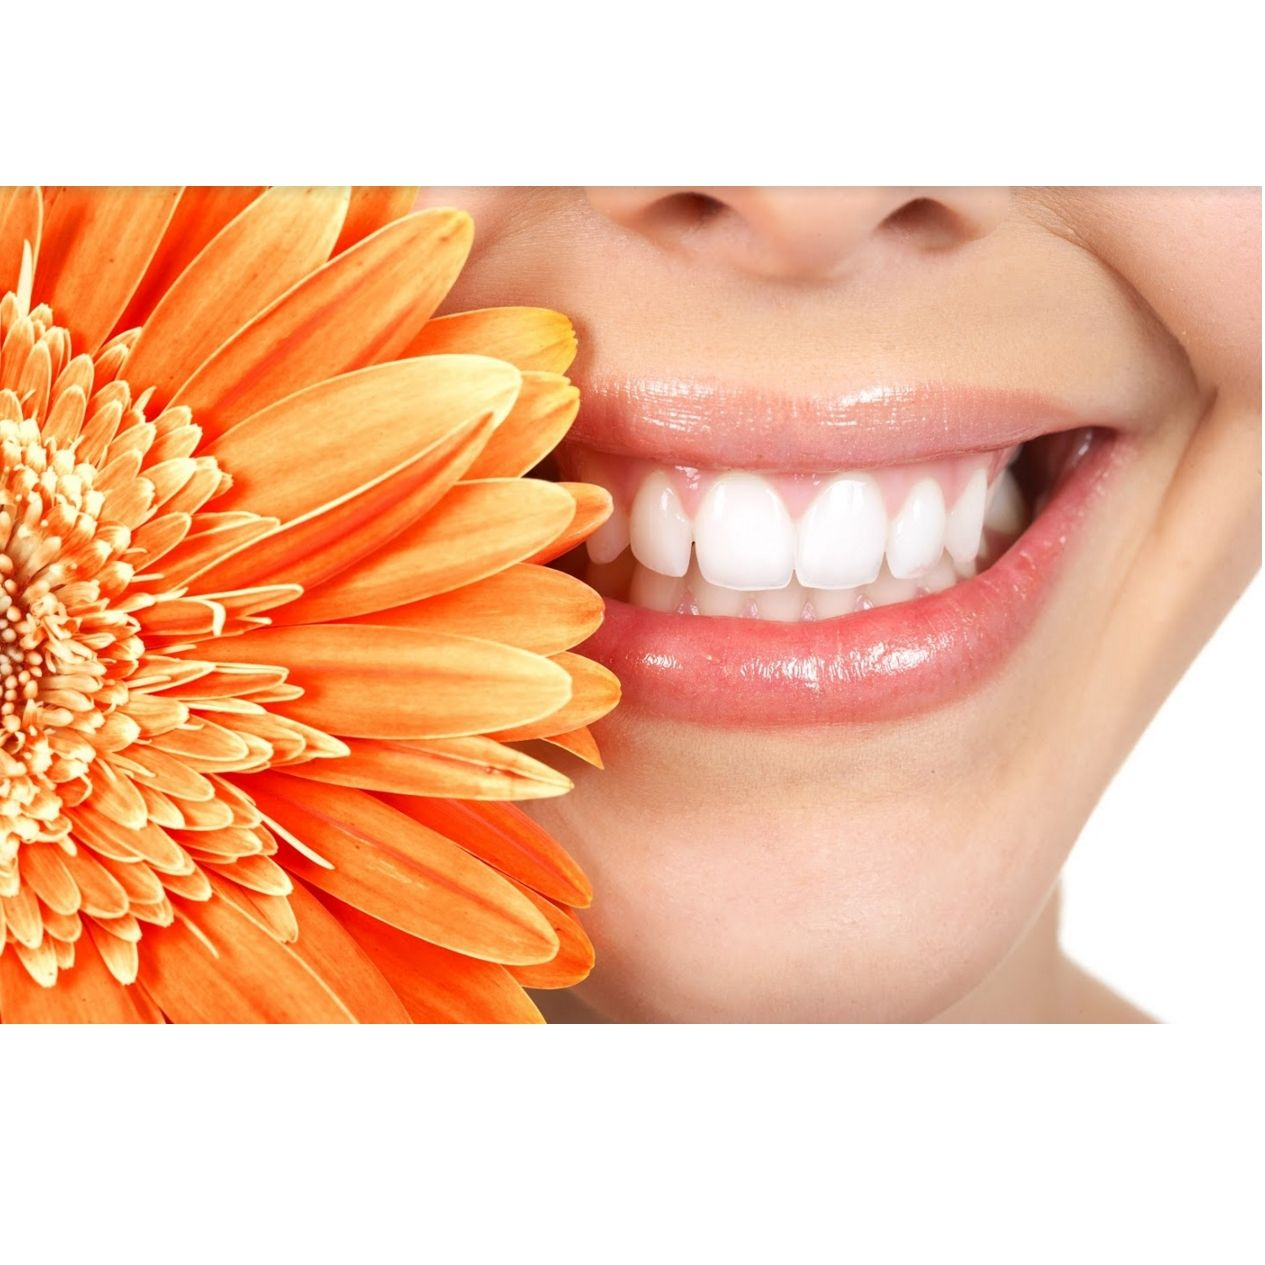 Estética dental: Tratamientos dentales de Centro Dental Sant Fost